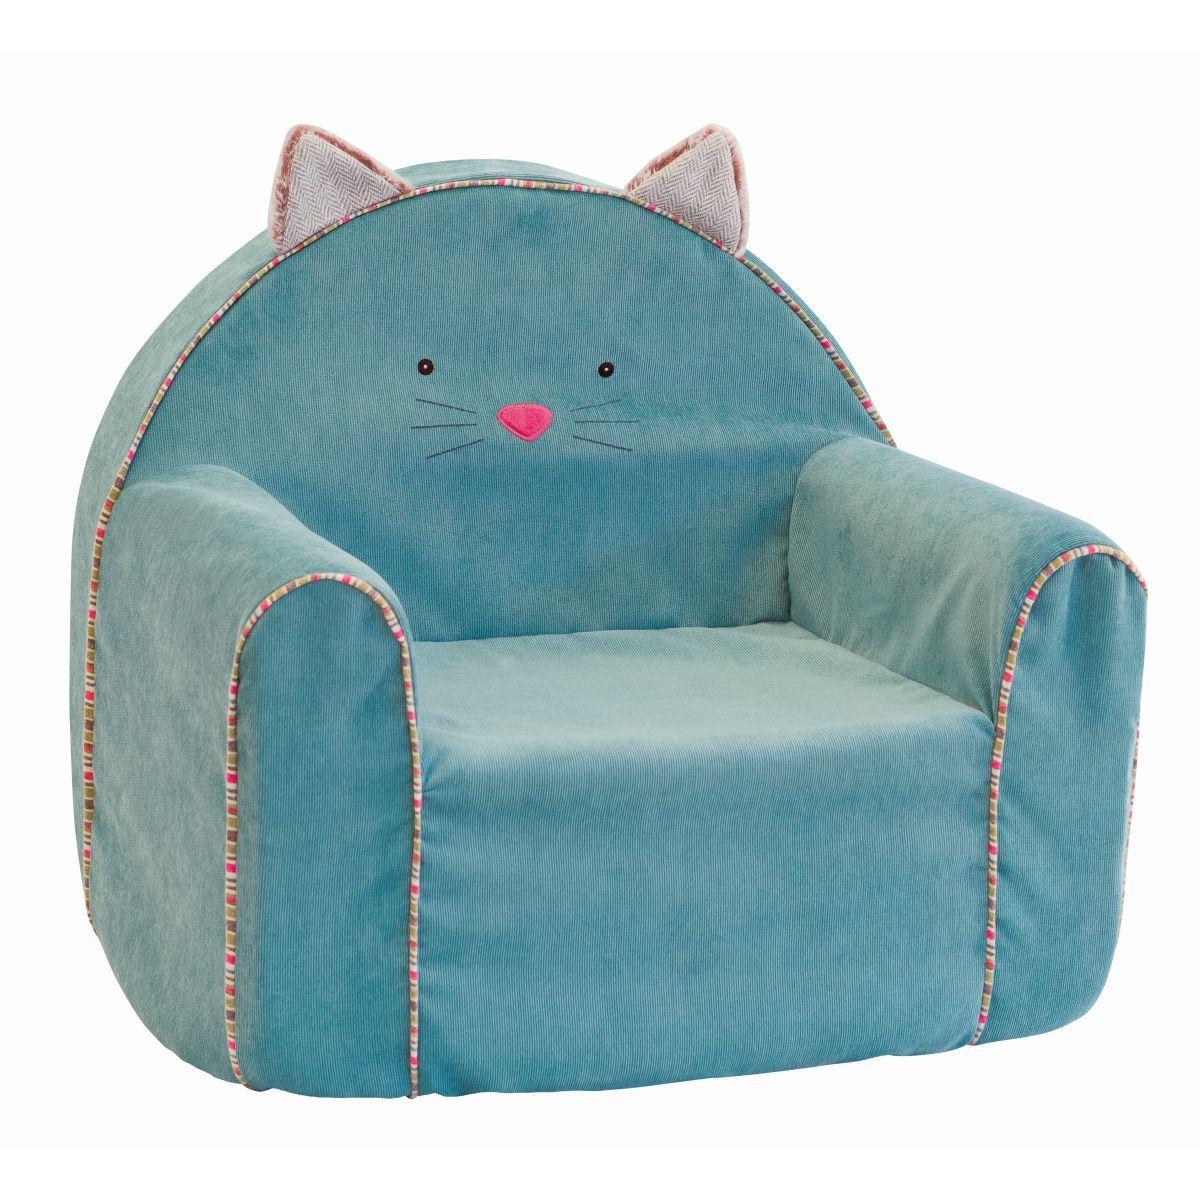 Kindersessel design  Kindersessel Katze in türkis aus der Kollektion Les Pachats im ...